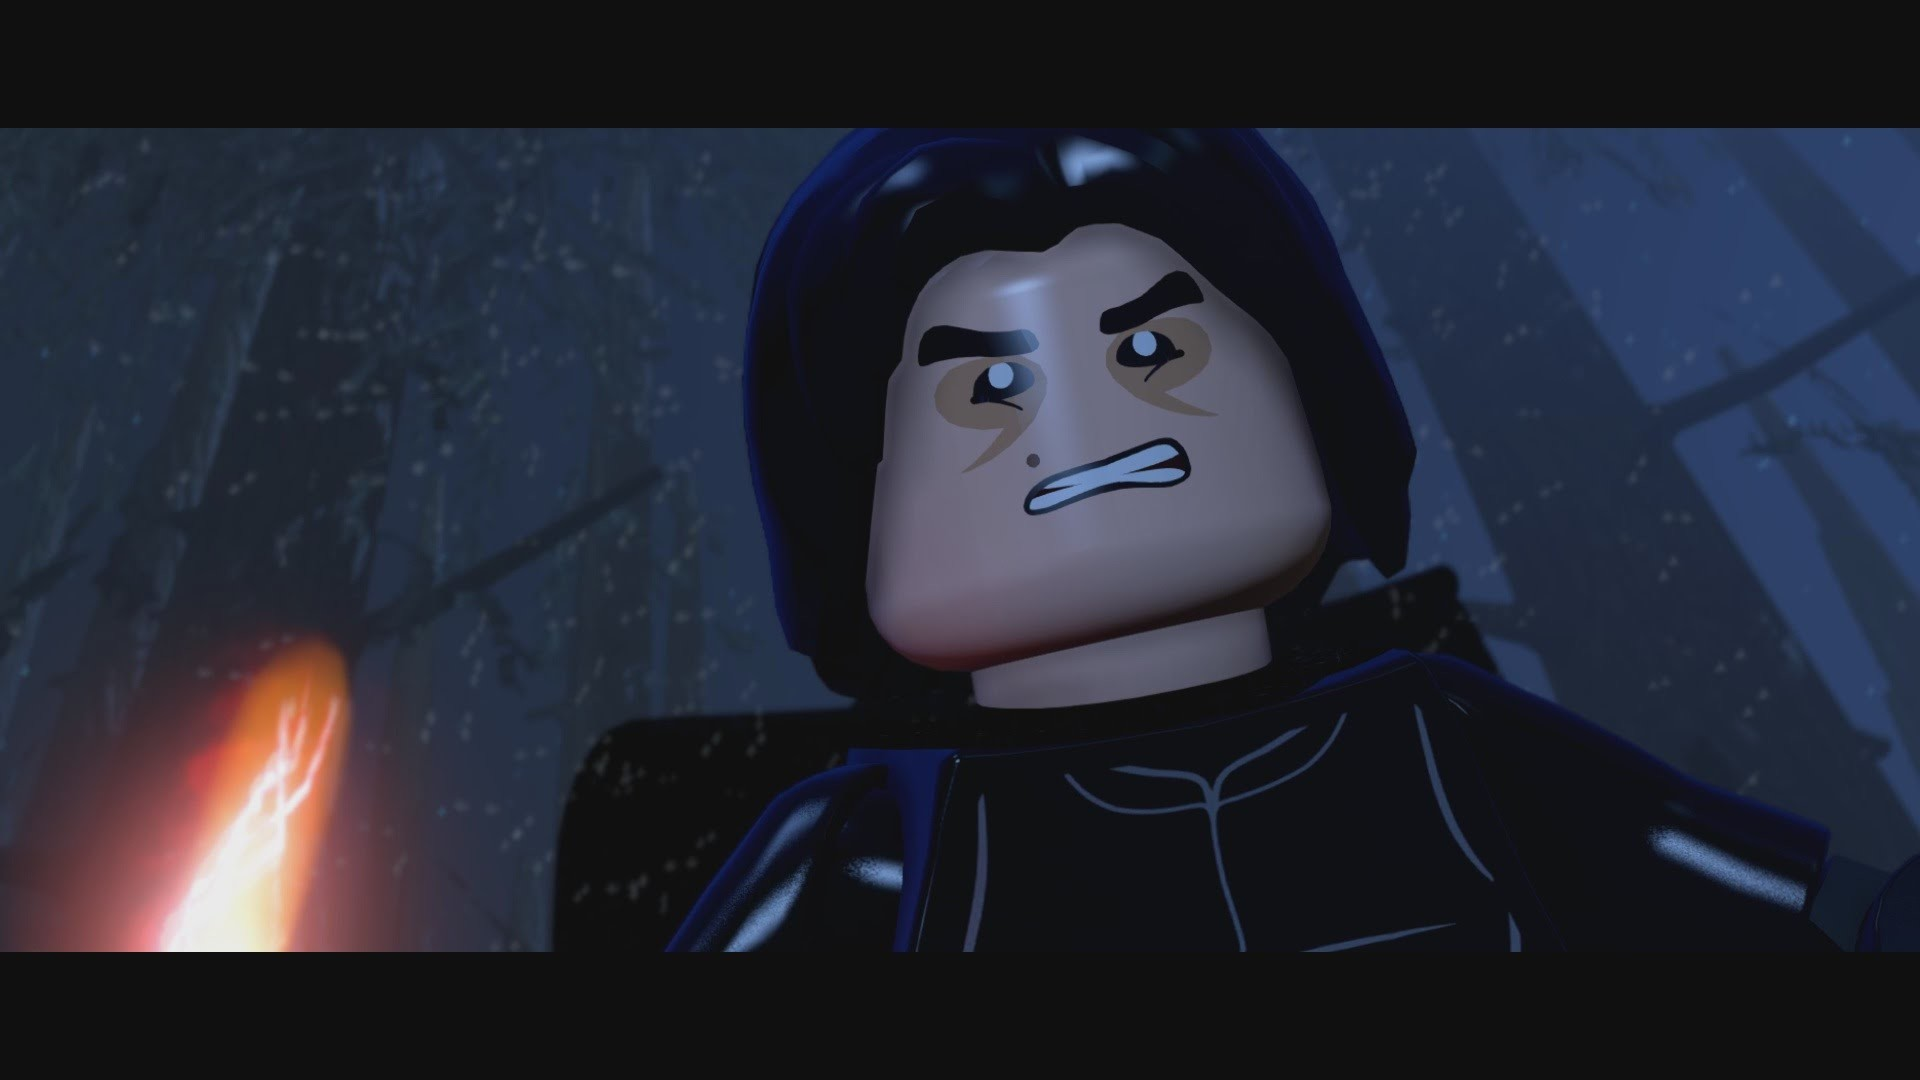 LEGO Star Wars: The Force Awakens – Kylo Ren Final Boss Battle Gameplay [ 1080p 60FPS HD] – YouTube